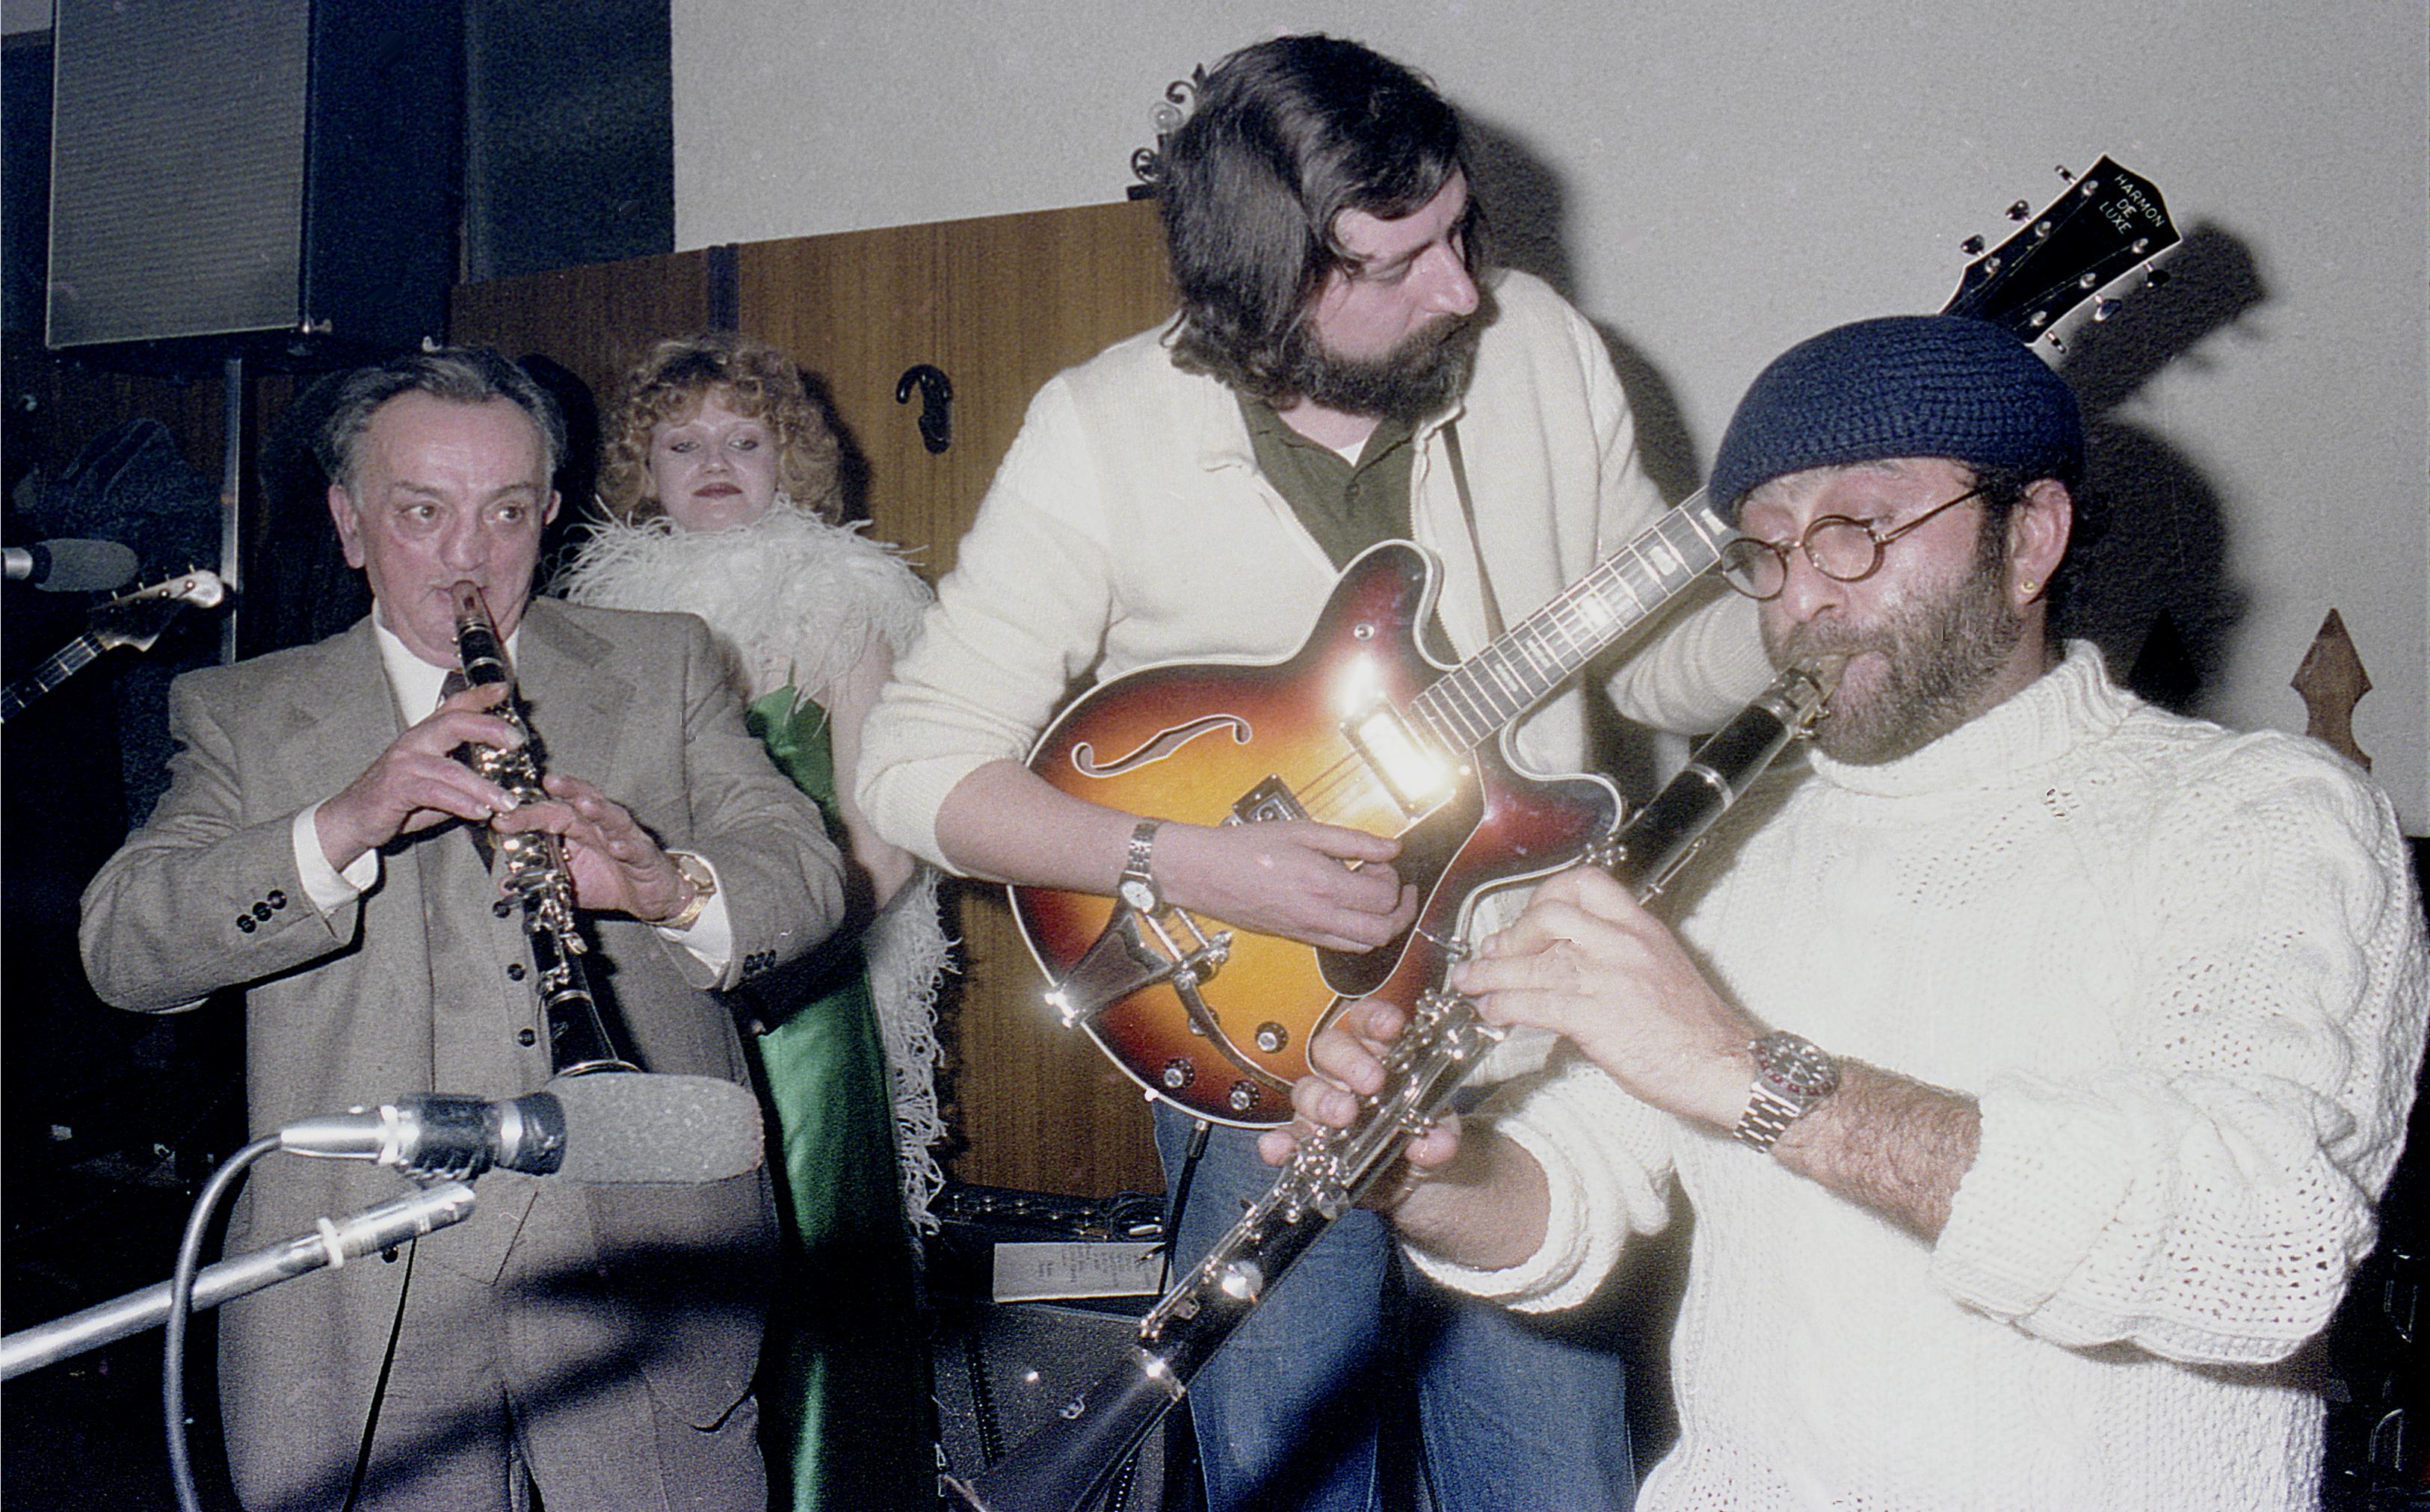 Historical shot at Vito's:from left Mister Vito, Guccini and Dalla